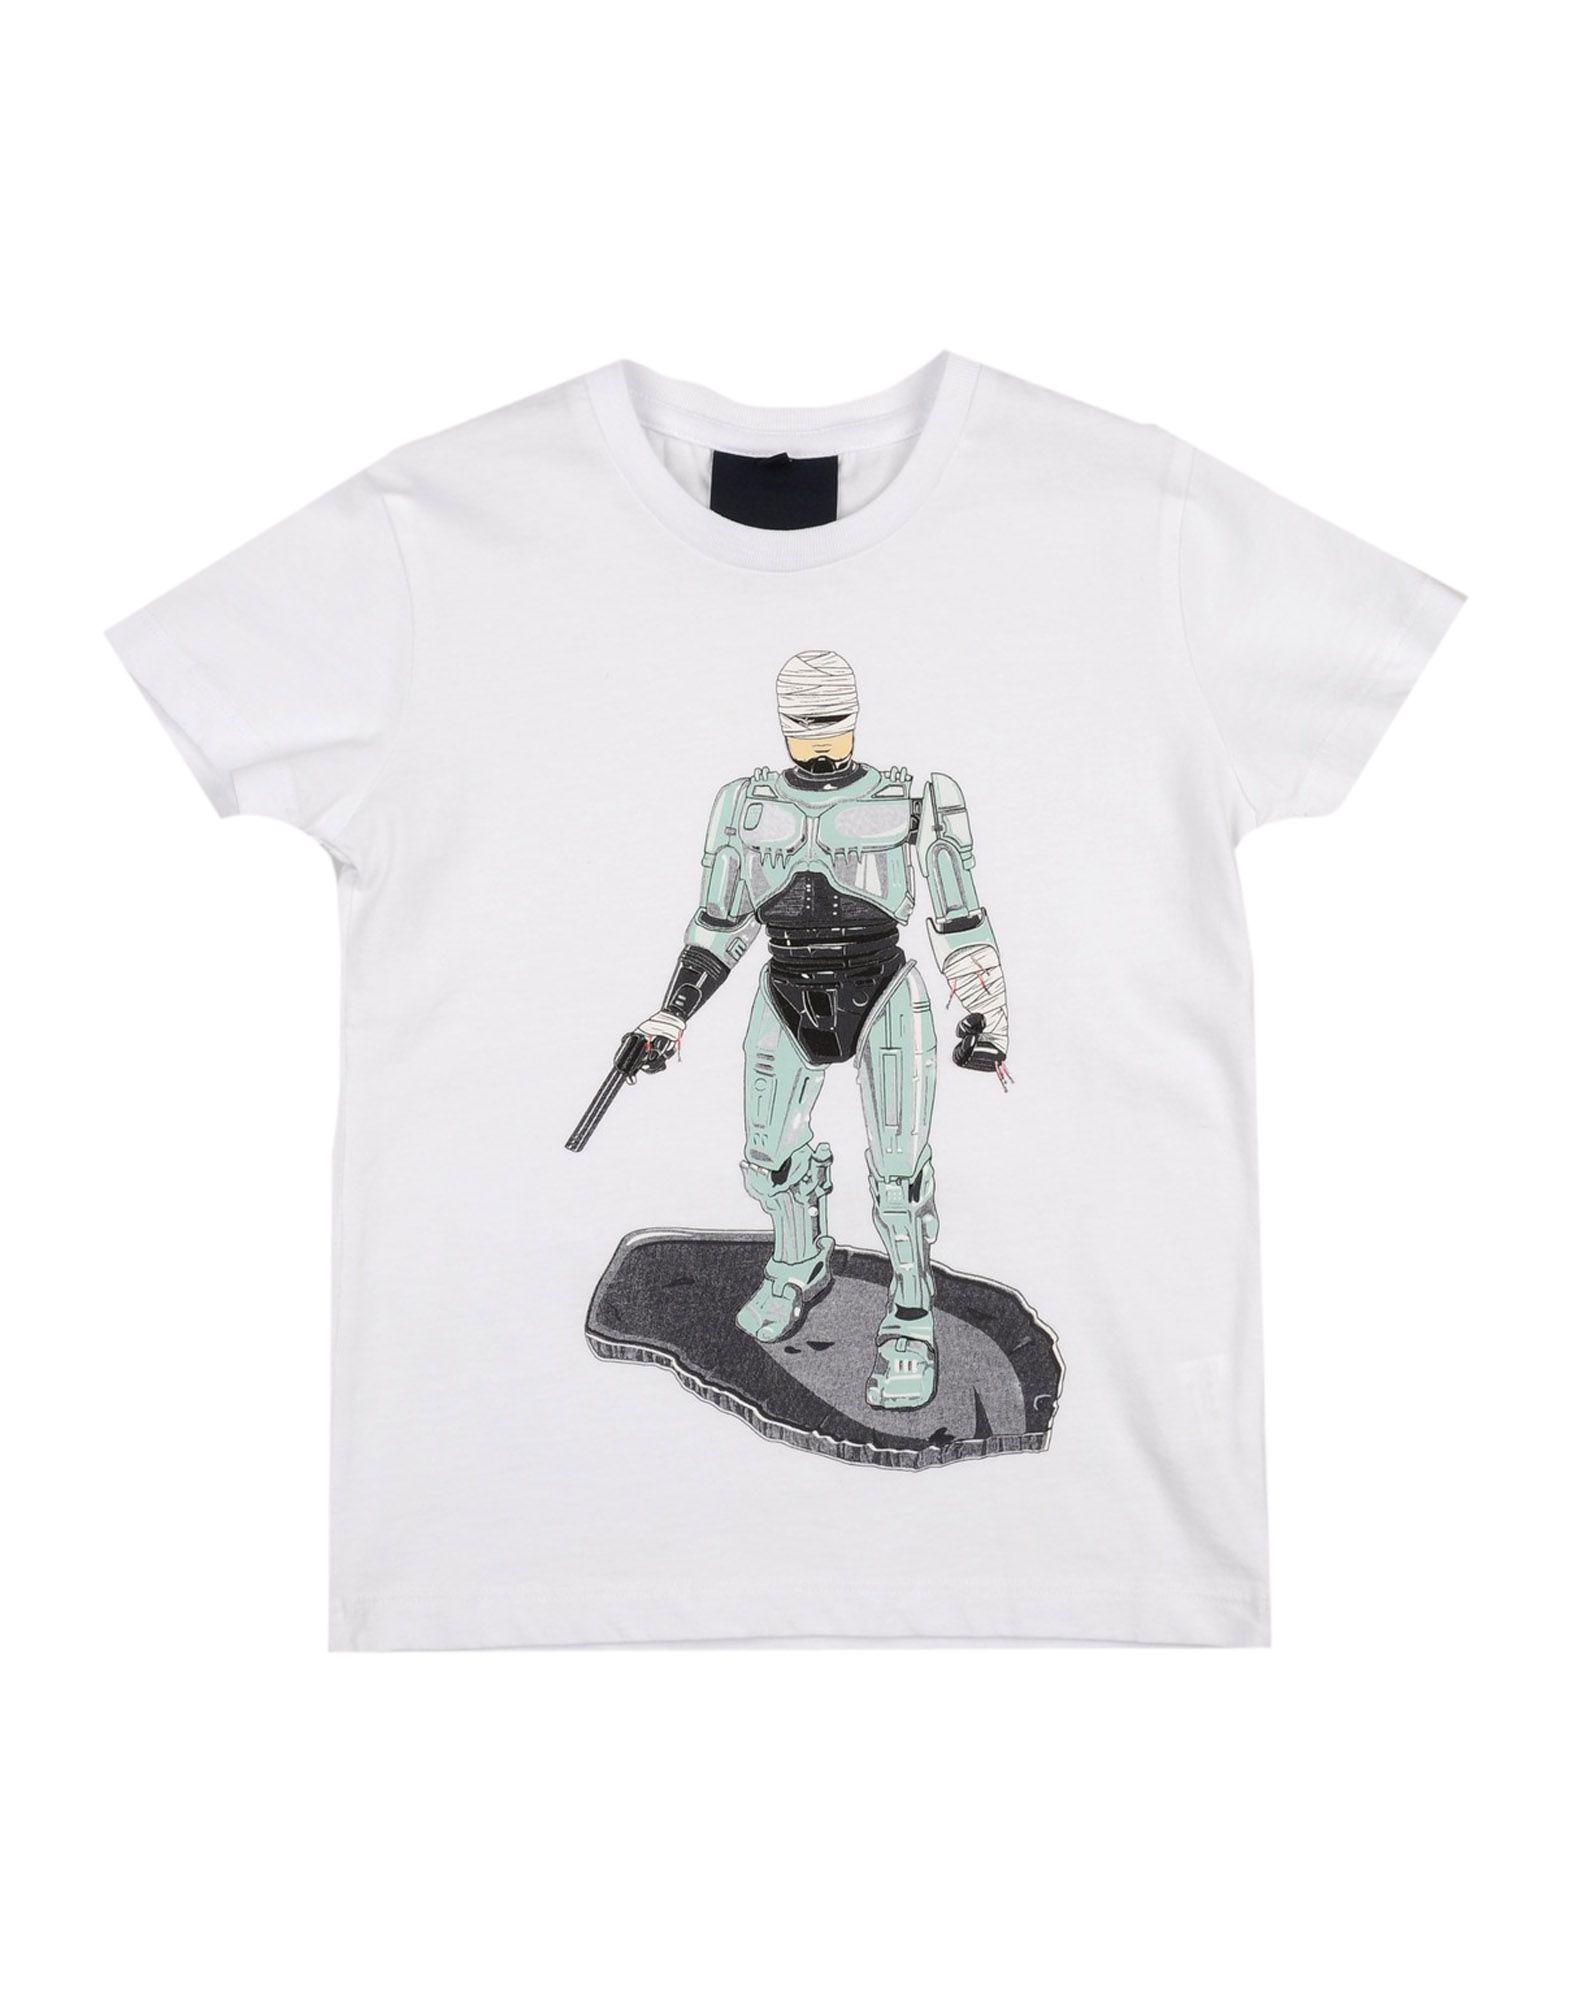 PHARMACY INDUSTRY Tshirts